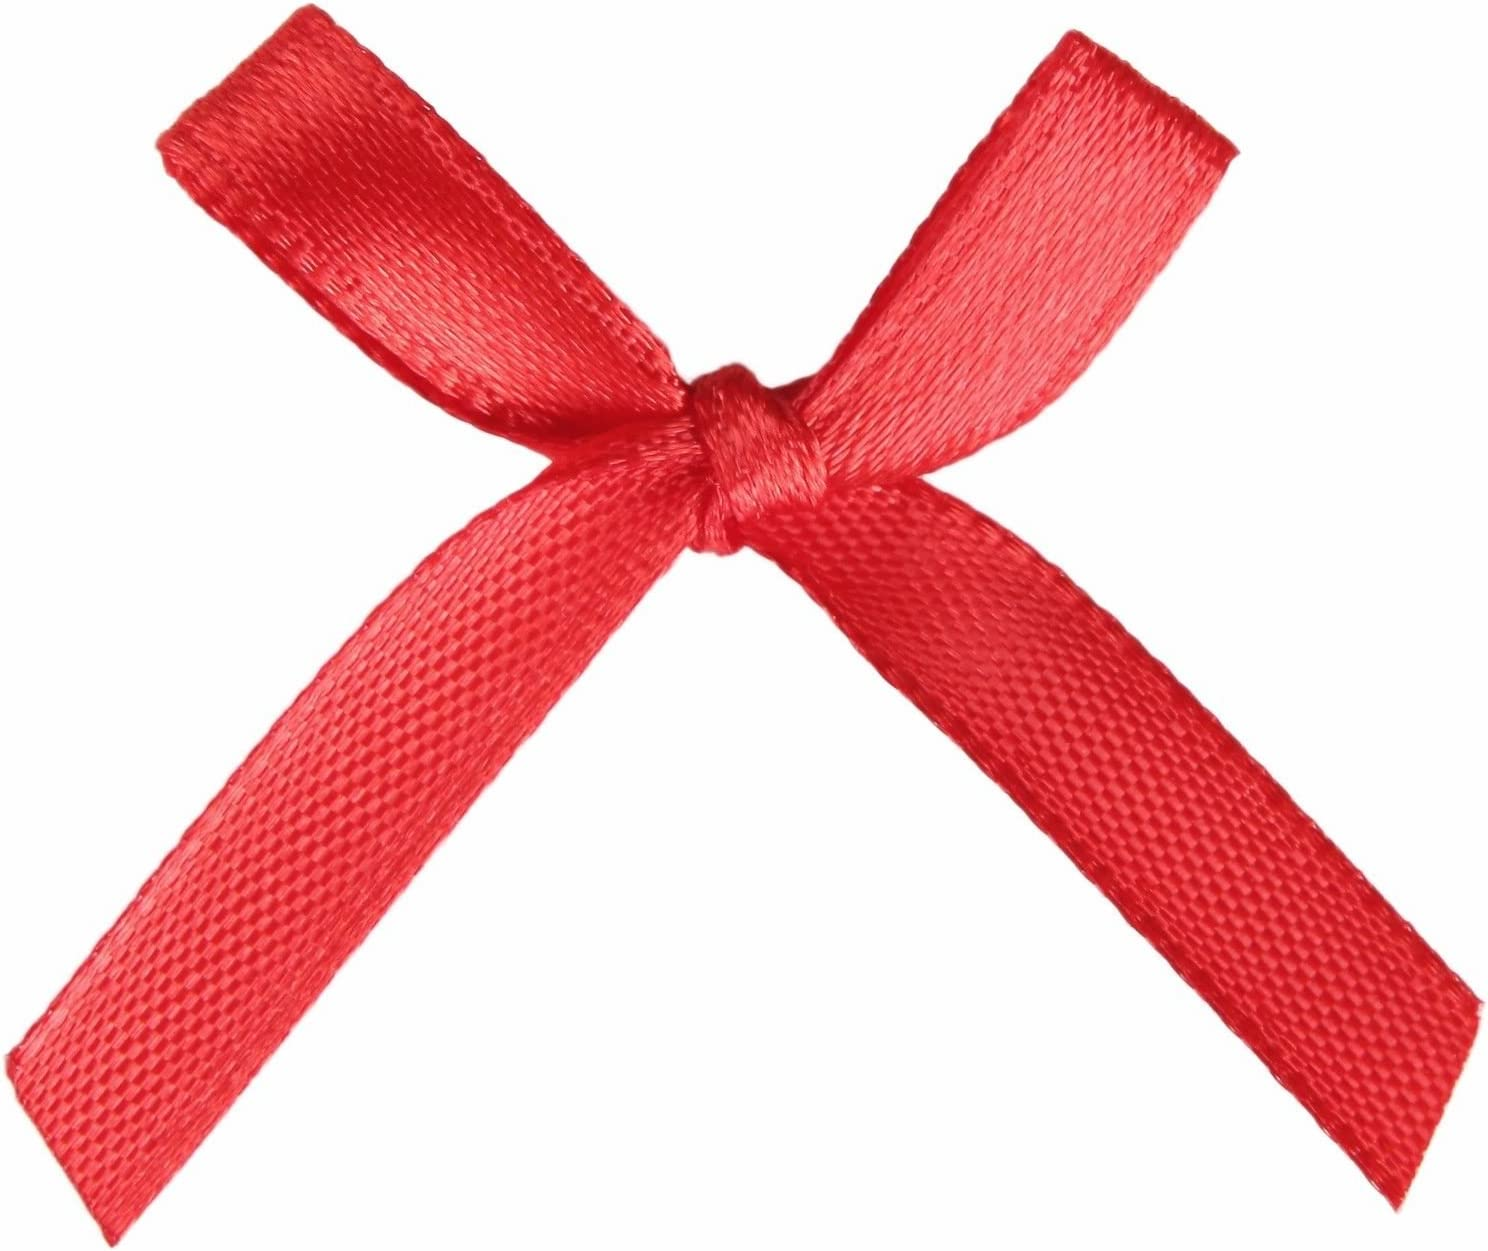 50 Pcs, Baby Blue AKA 50//100 Pcs Bow Satin 3cm Wide Ribbon Pre-Tied Bows Craft Scrapbooking Various Colours